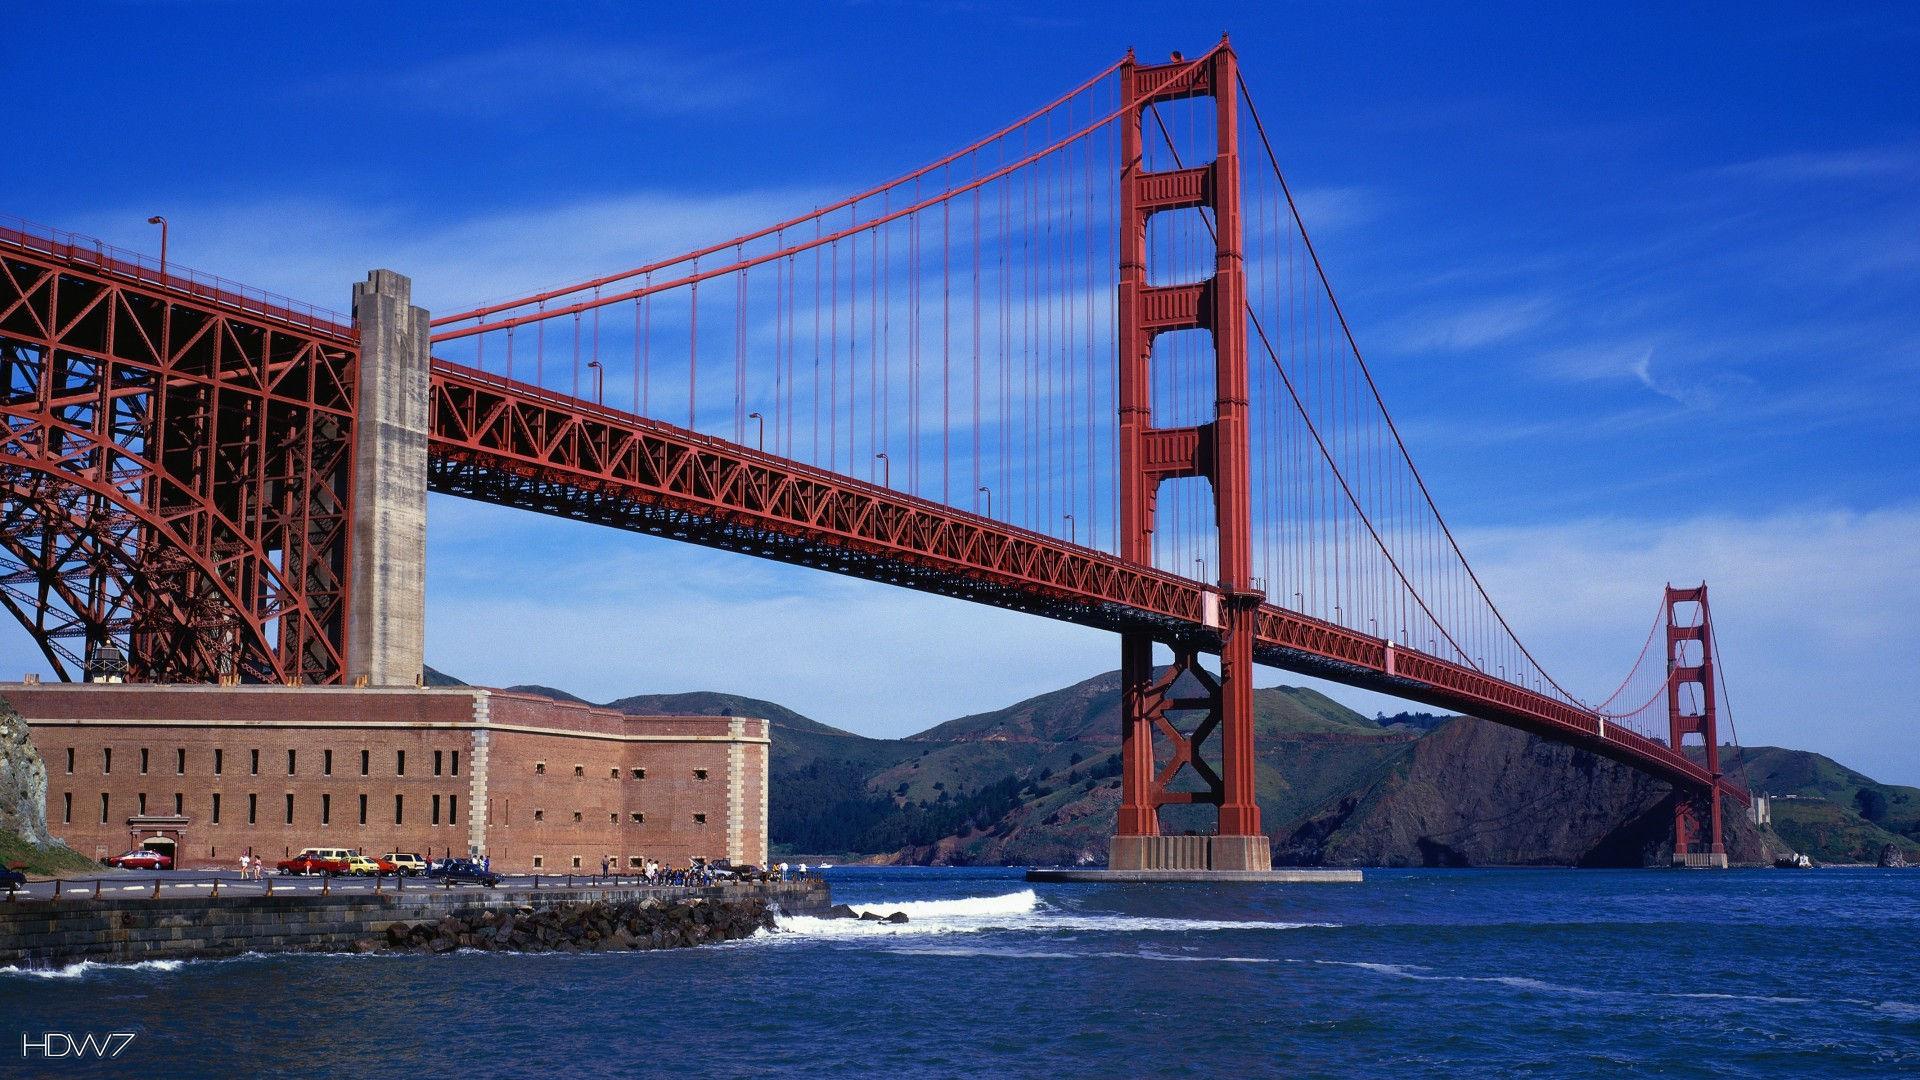 San Francisco Wallpaper 1920x1080